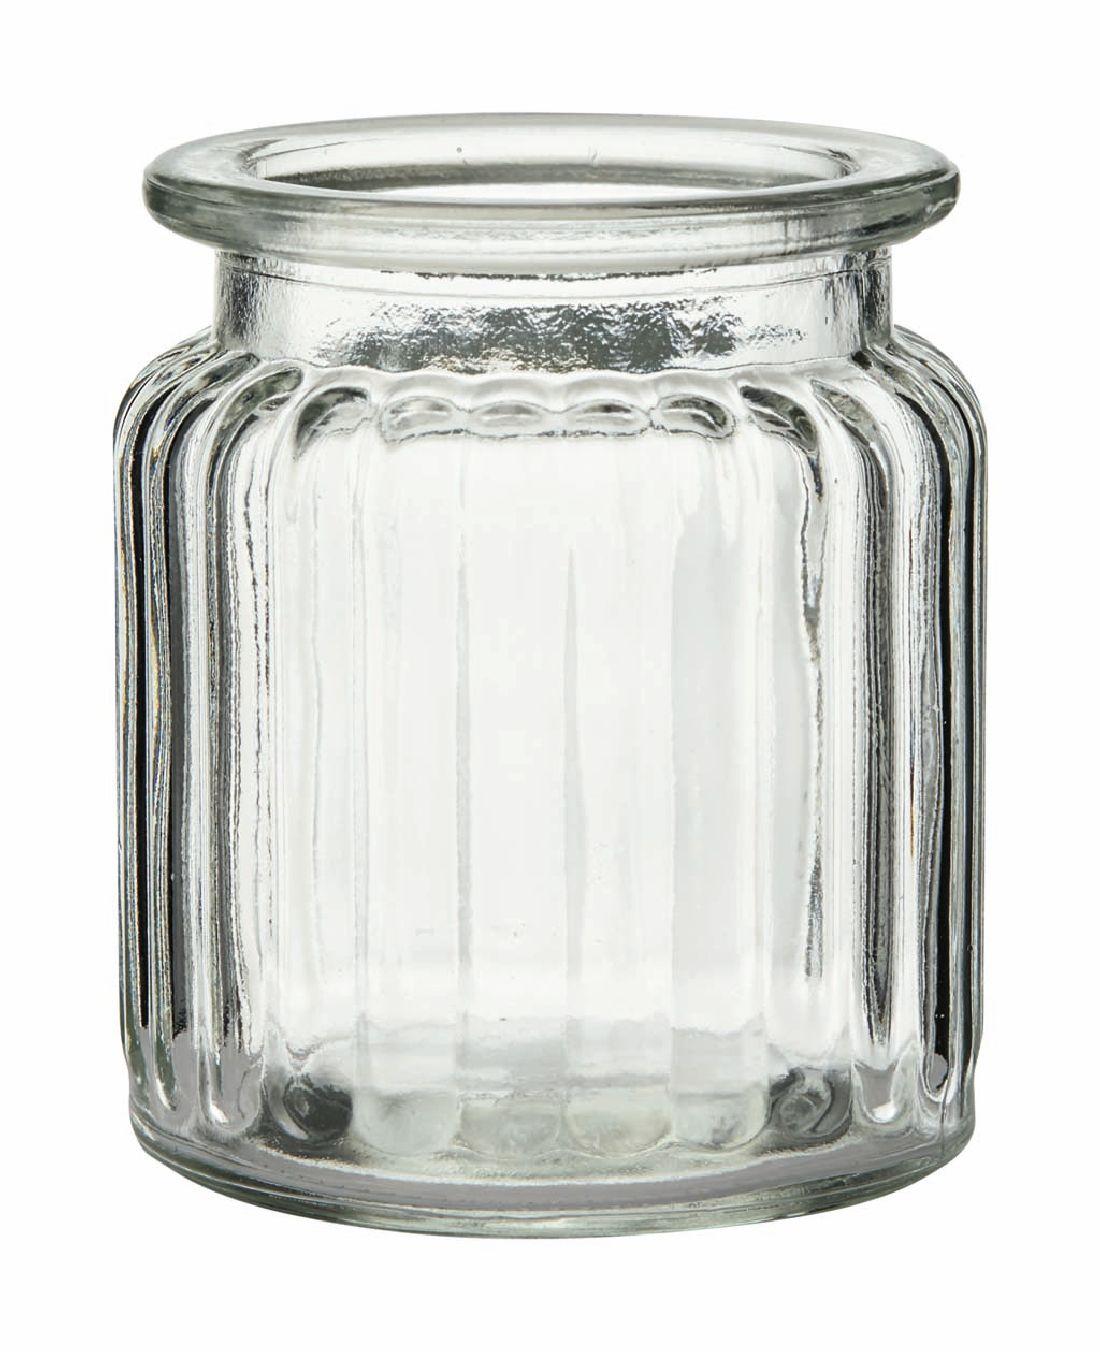 Rundrandglas Vintage gerippt KLAR 260 Ø7,5xH9cm